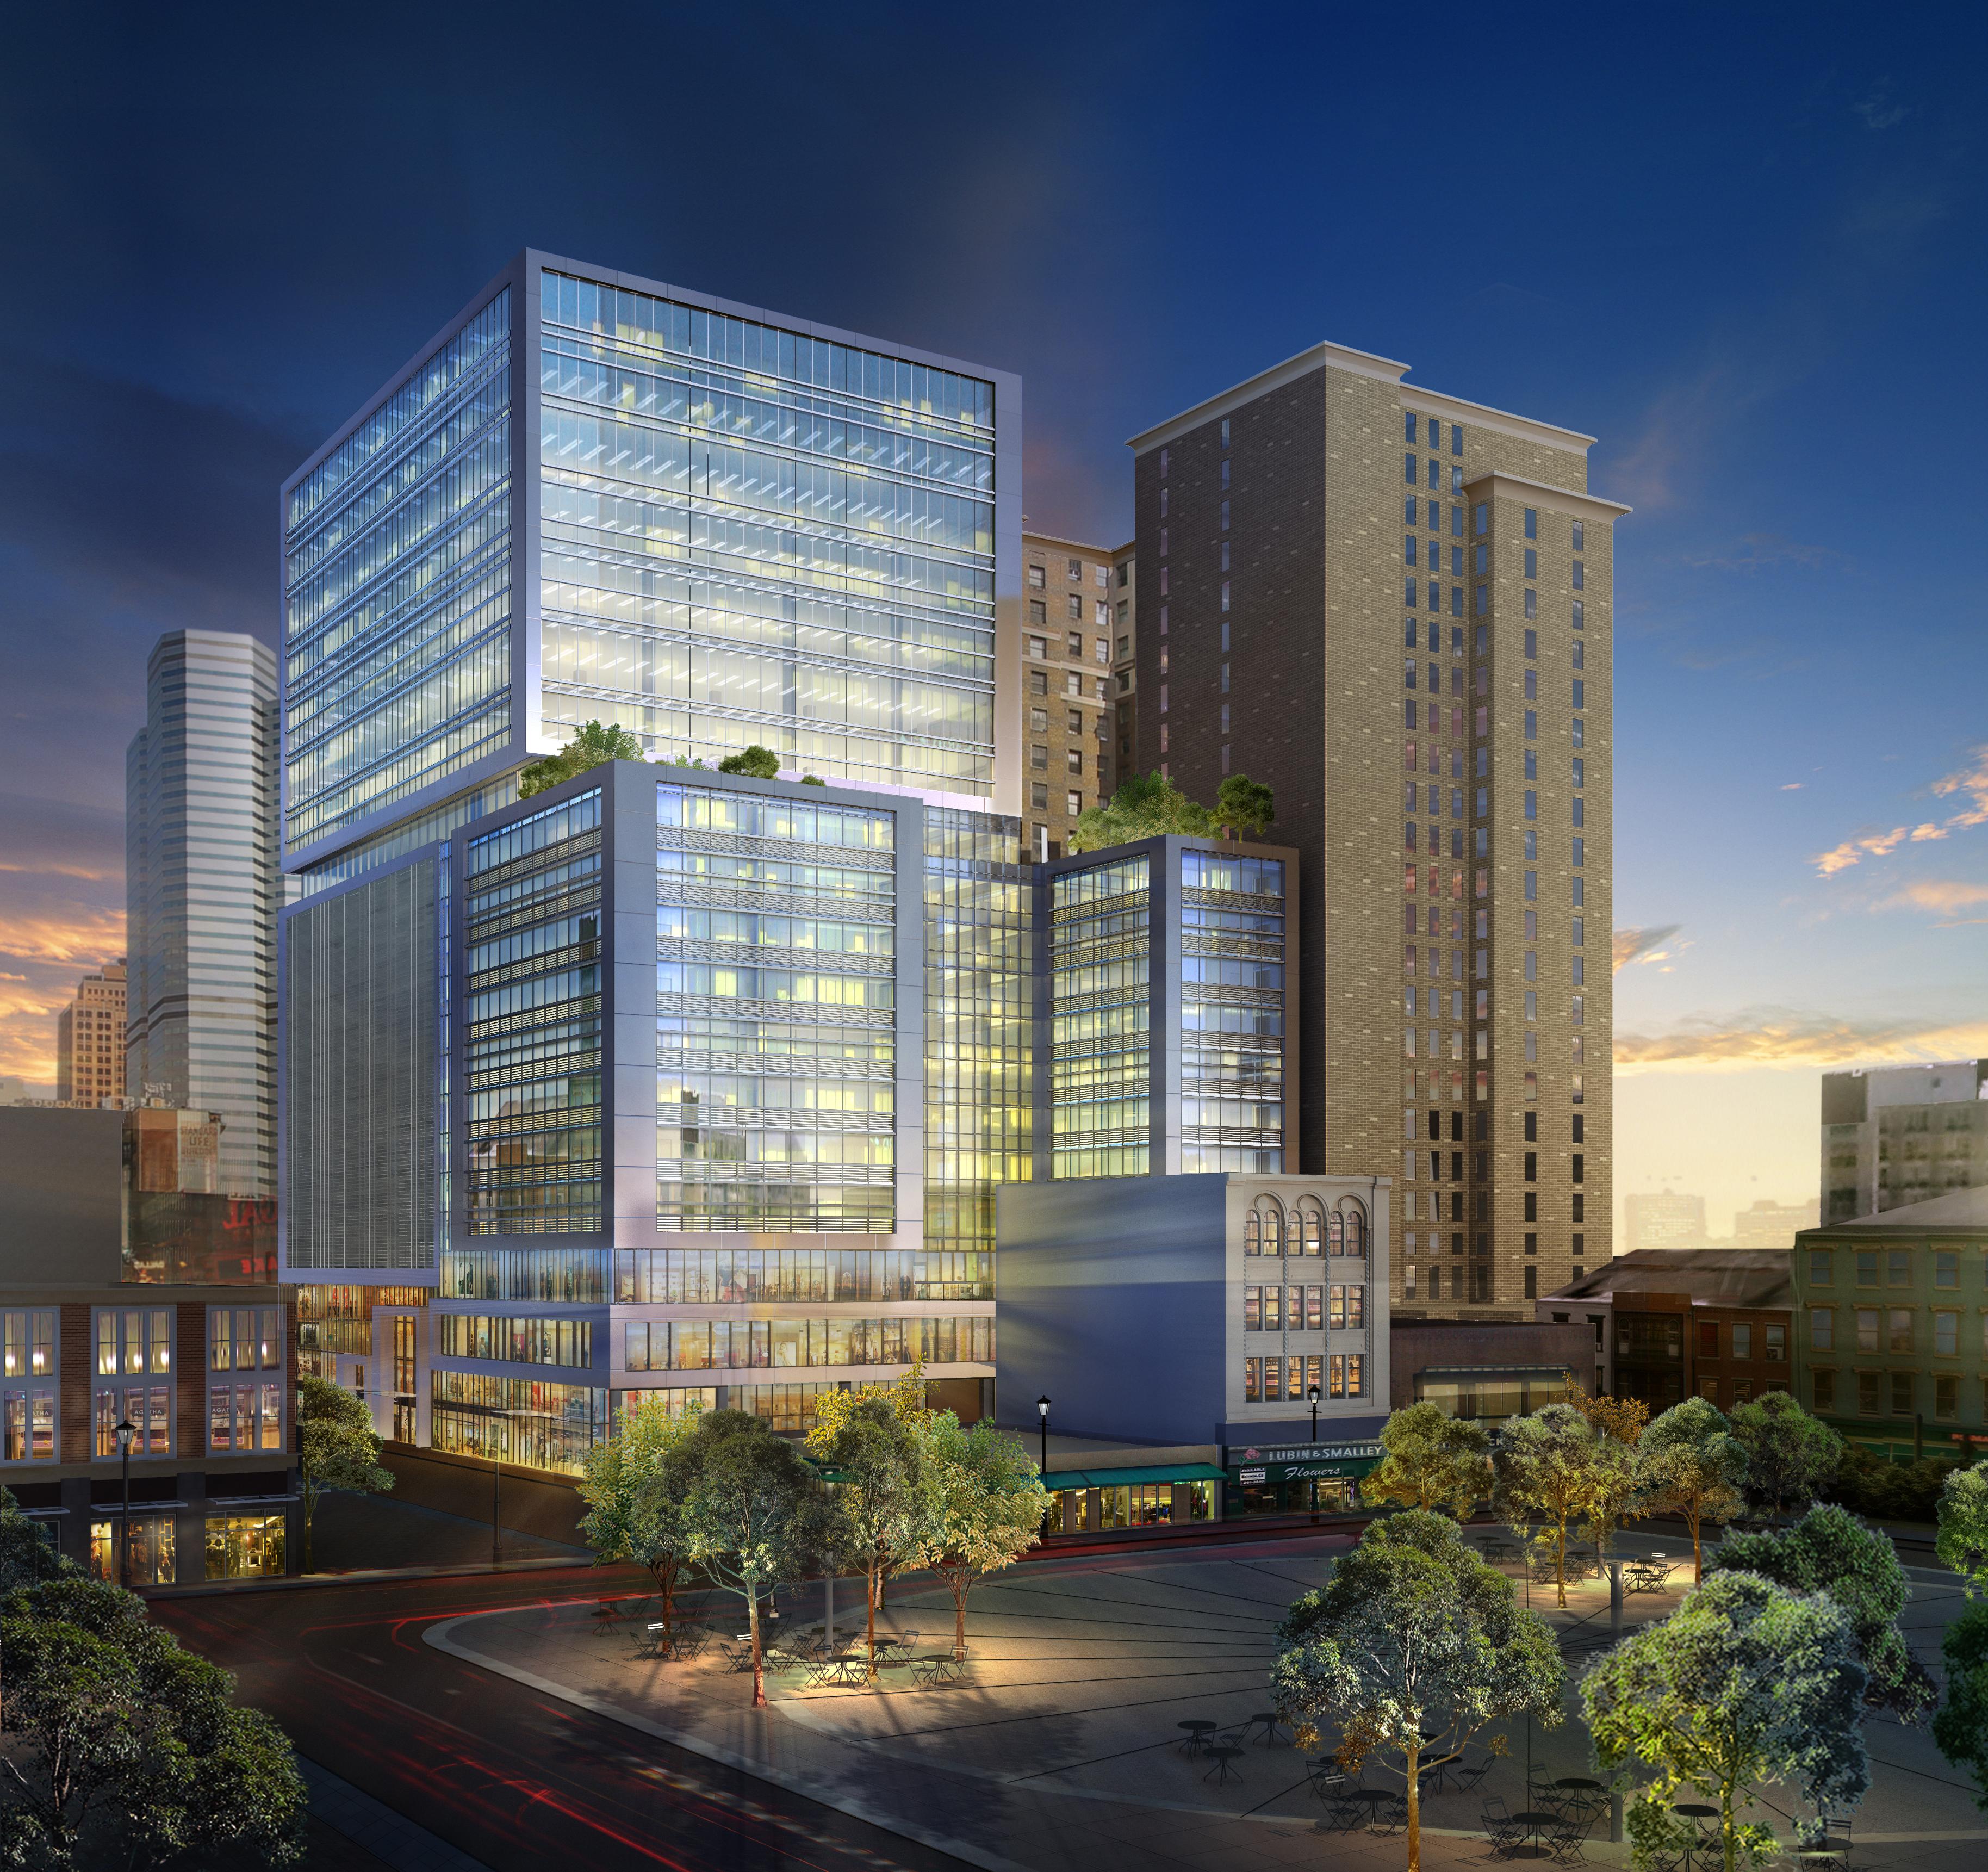 Hilton Garden Inn Denver South Park Meadows Area: Hilton Garden Inn Pittsburgh Opens In The Heart Of Downtown